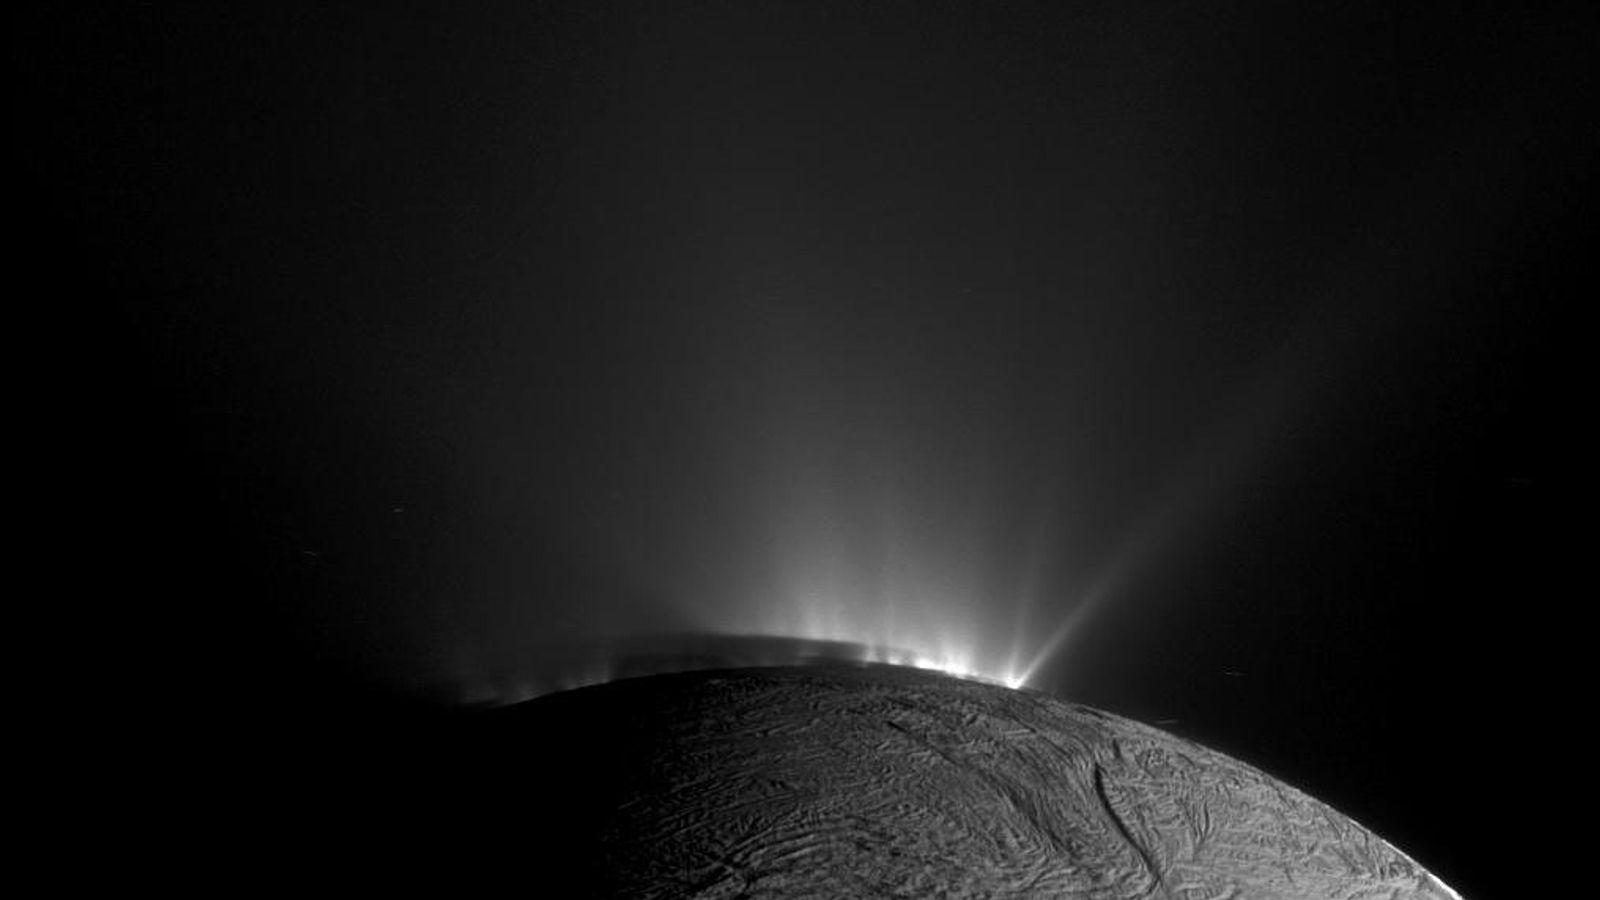 La sonda Cassini de la NASA sacó esta foto de géiseres expulsando material helado en la ...